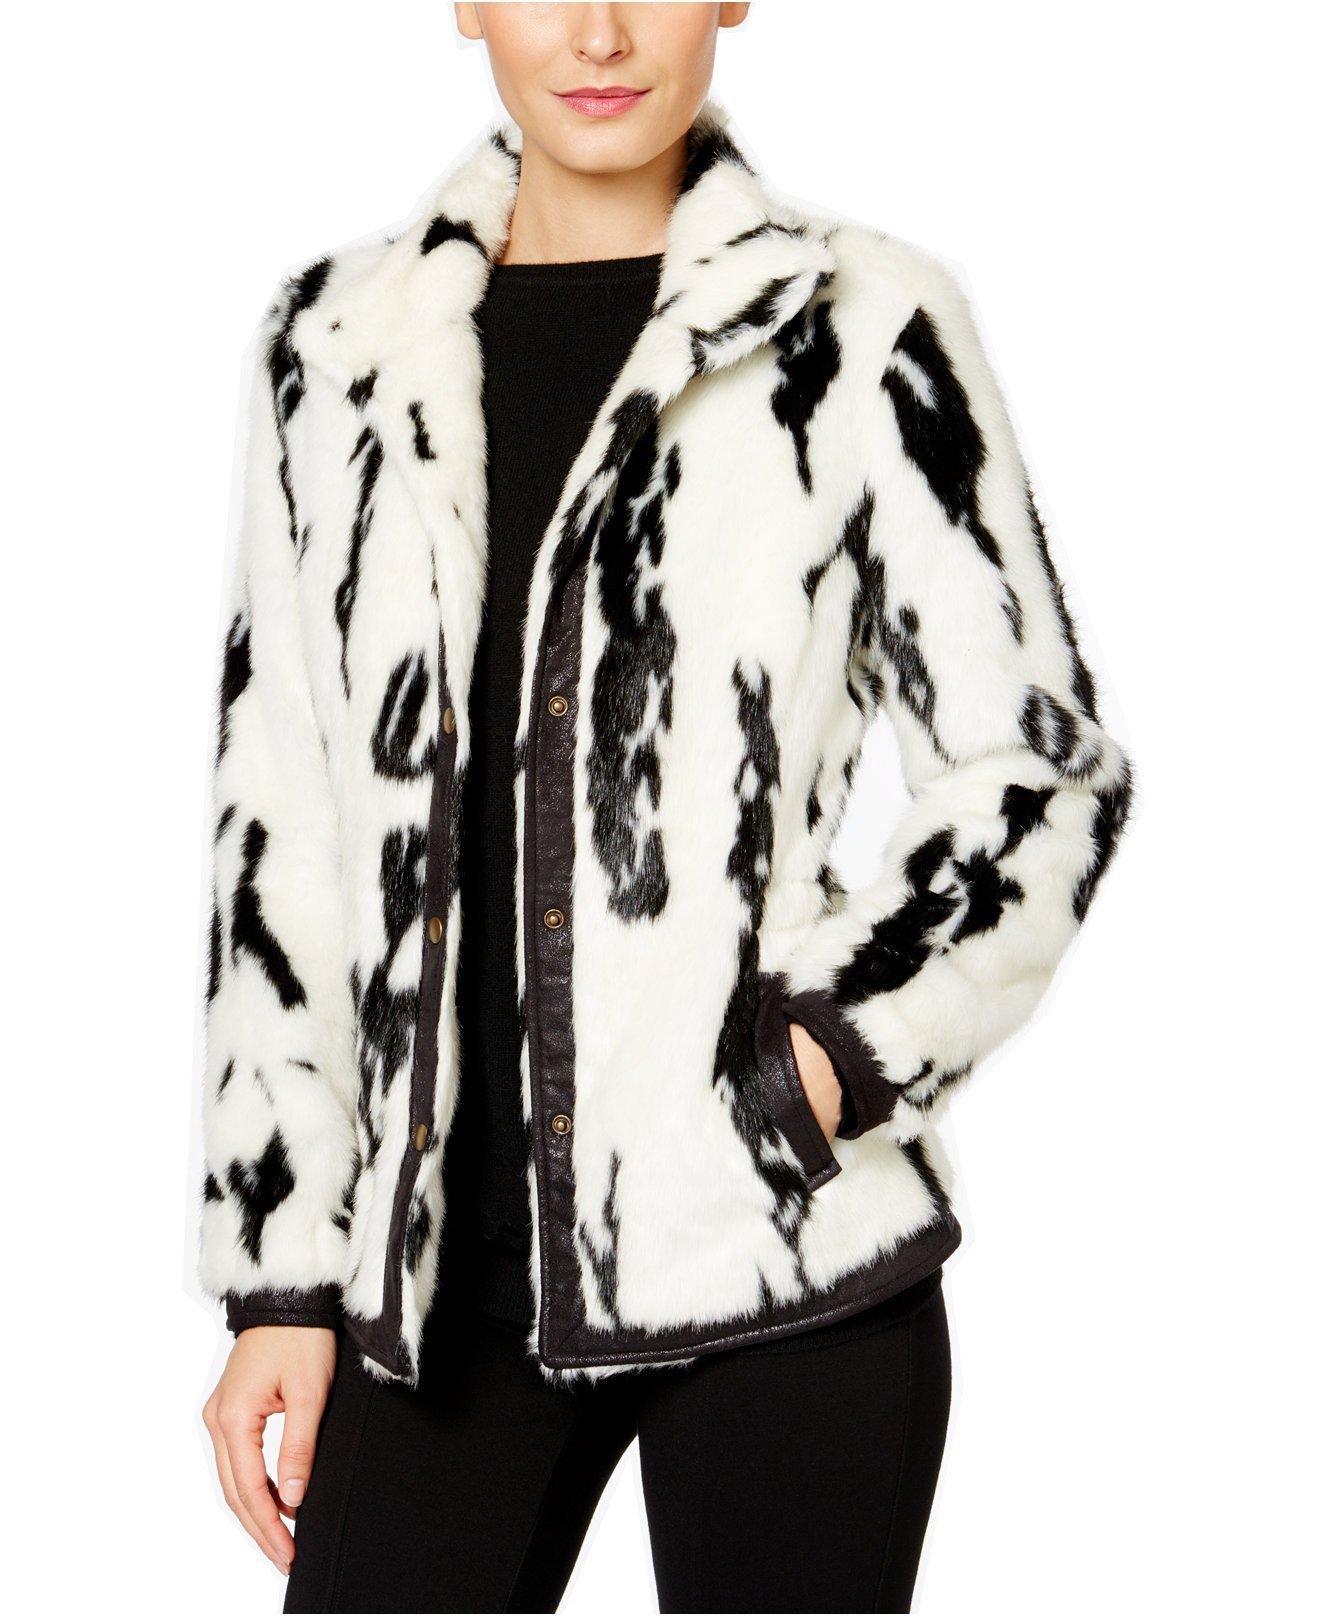 INC International Concepts Women's Faux-Fur Jacket (Large, Washed White)